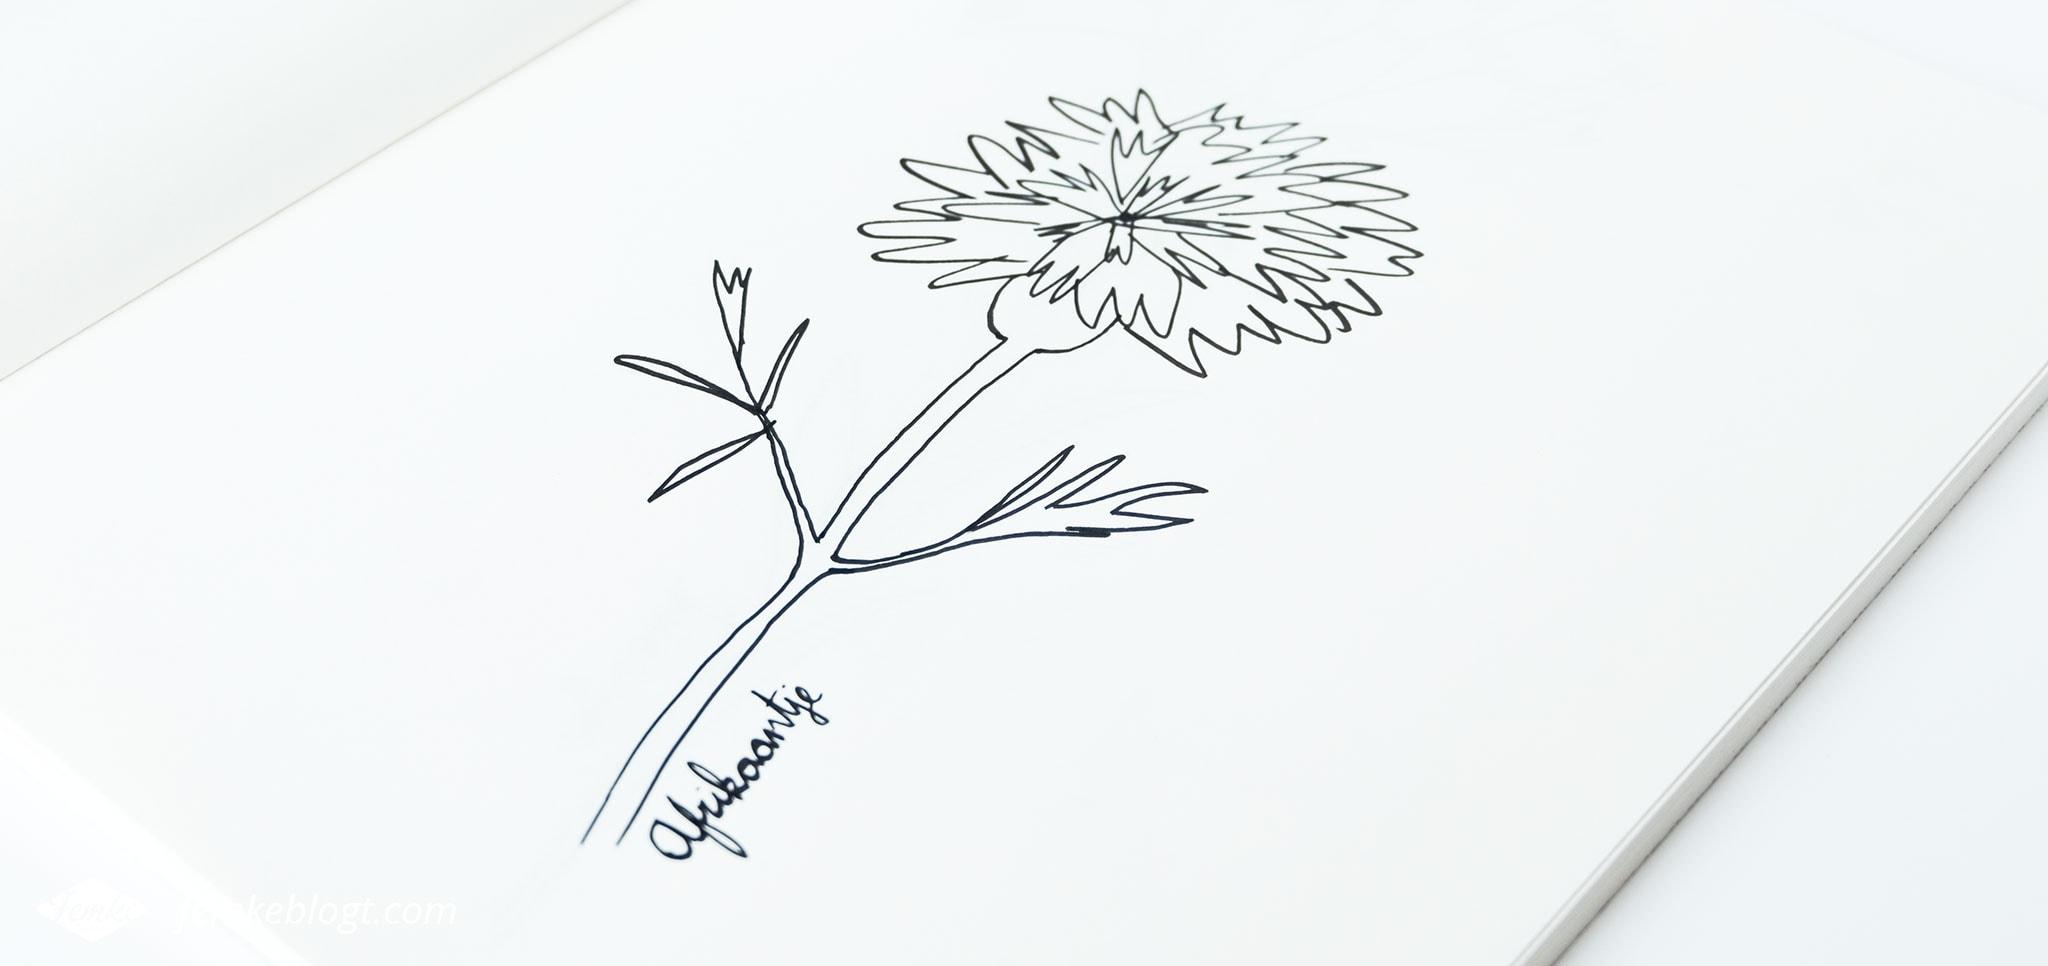 31 Dagen bloemen #7 – Afrikaantje